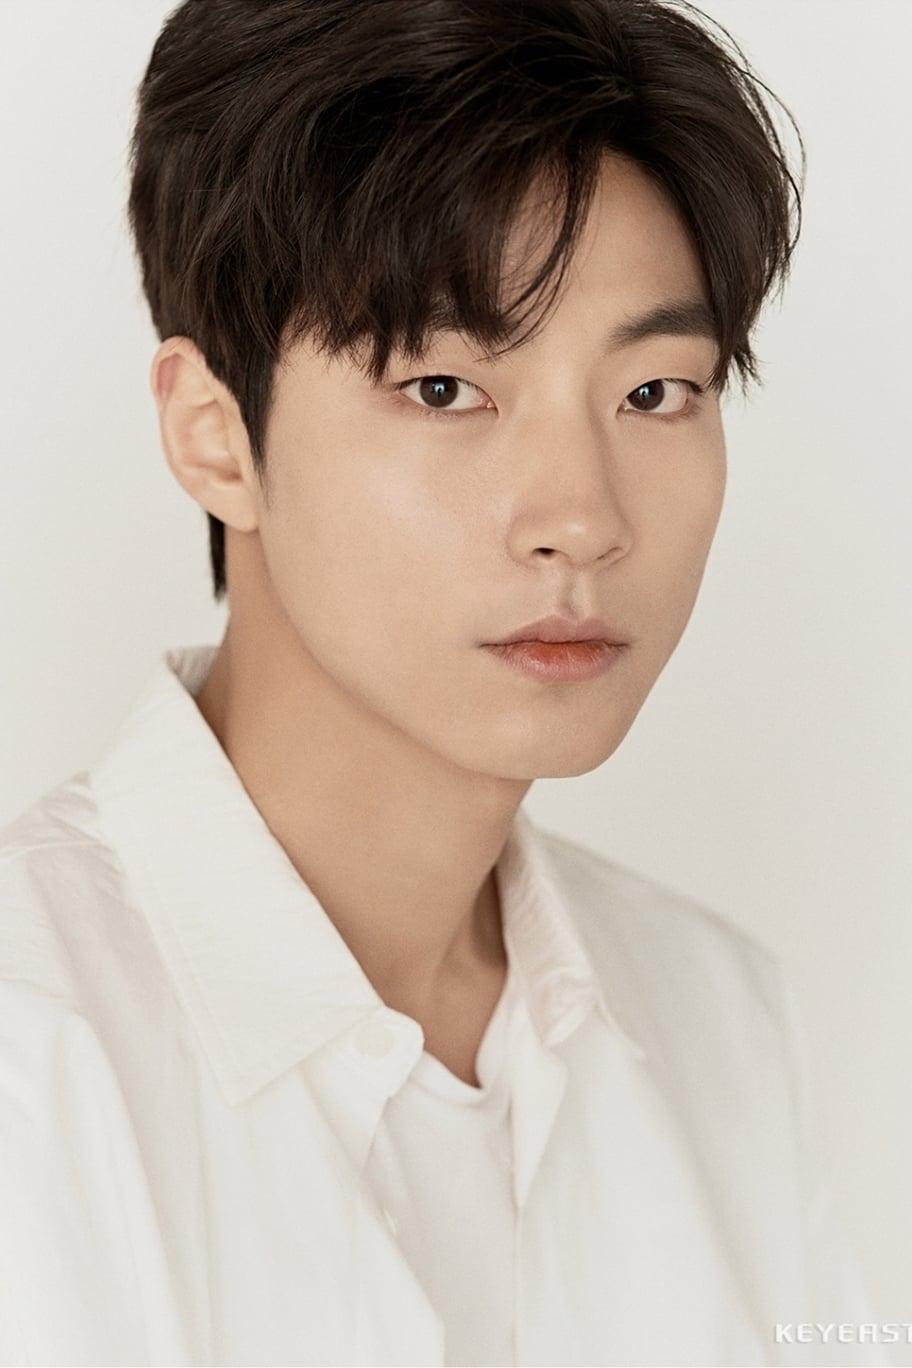 Hwang In-Yeob